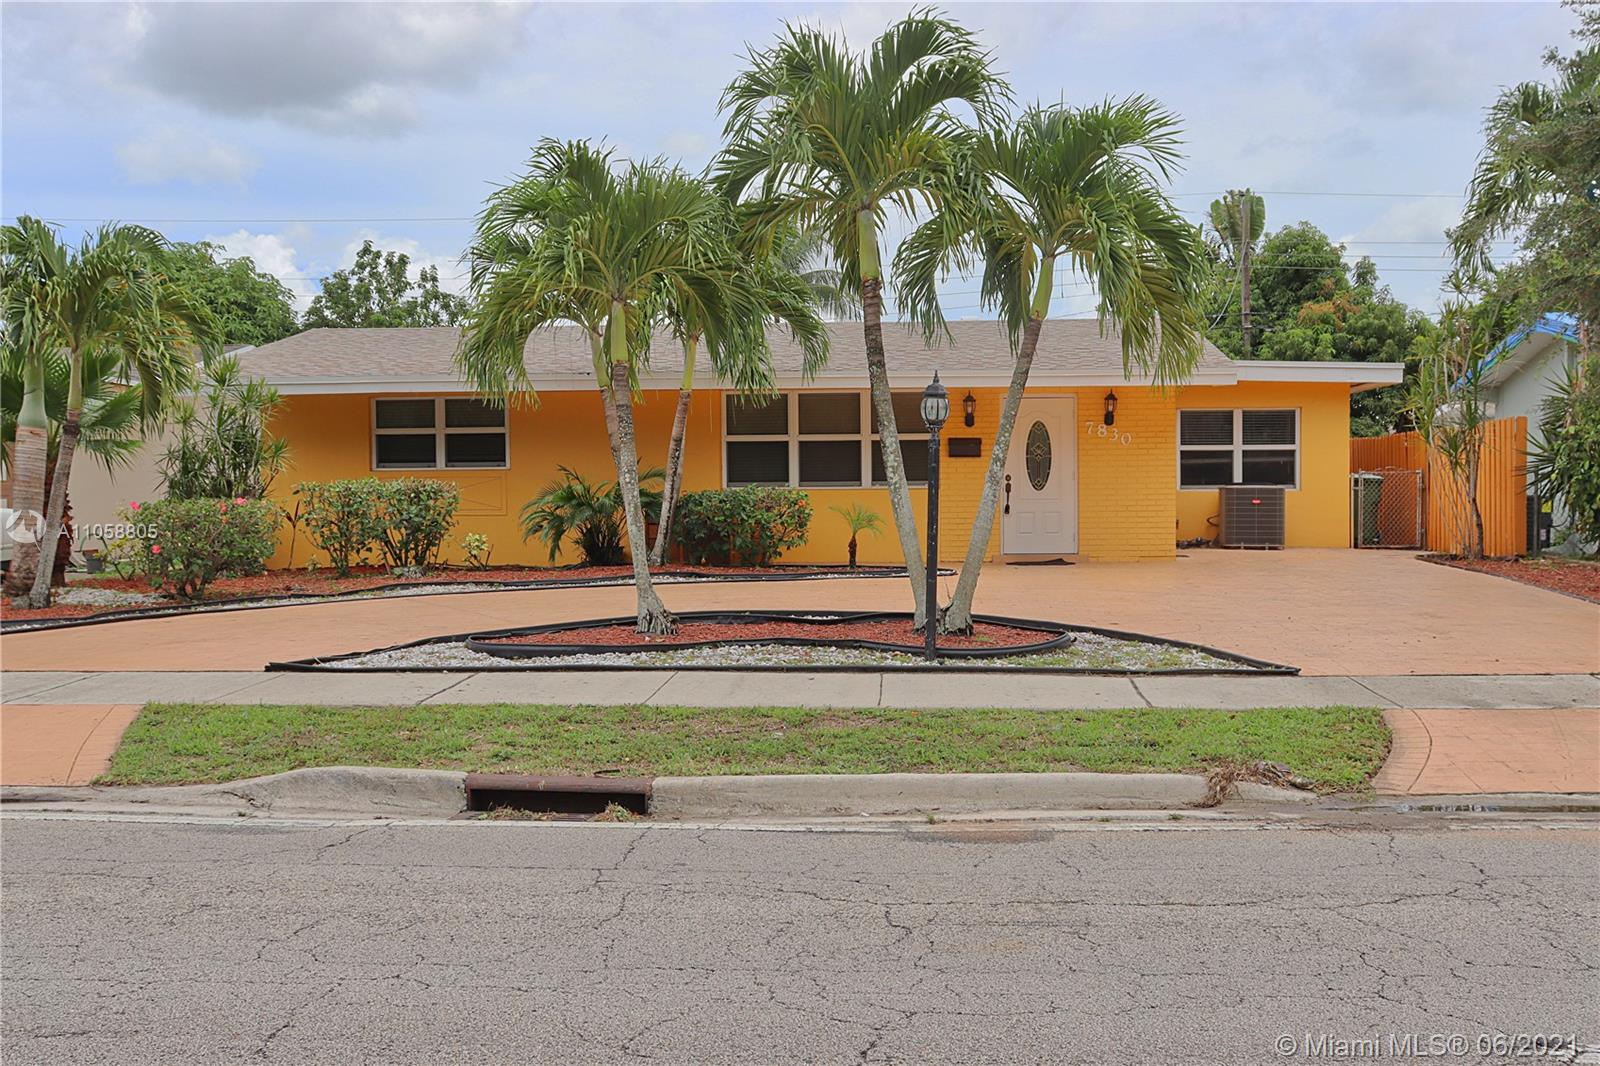 Boulevard Heights - 7830 Taft St, Pembroke Pines, FL 33024